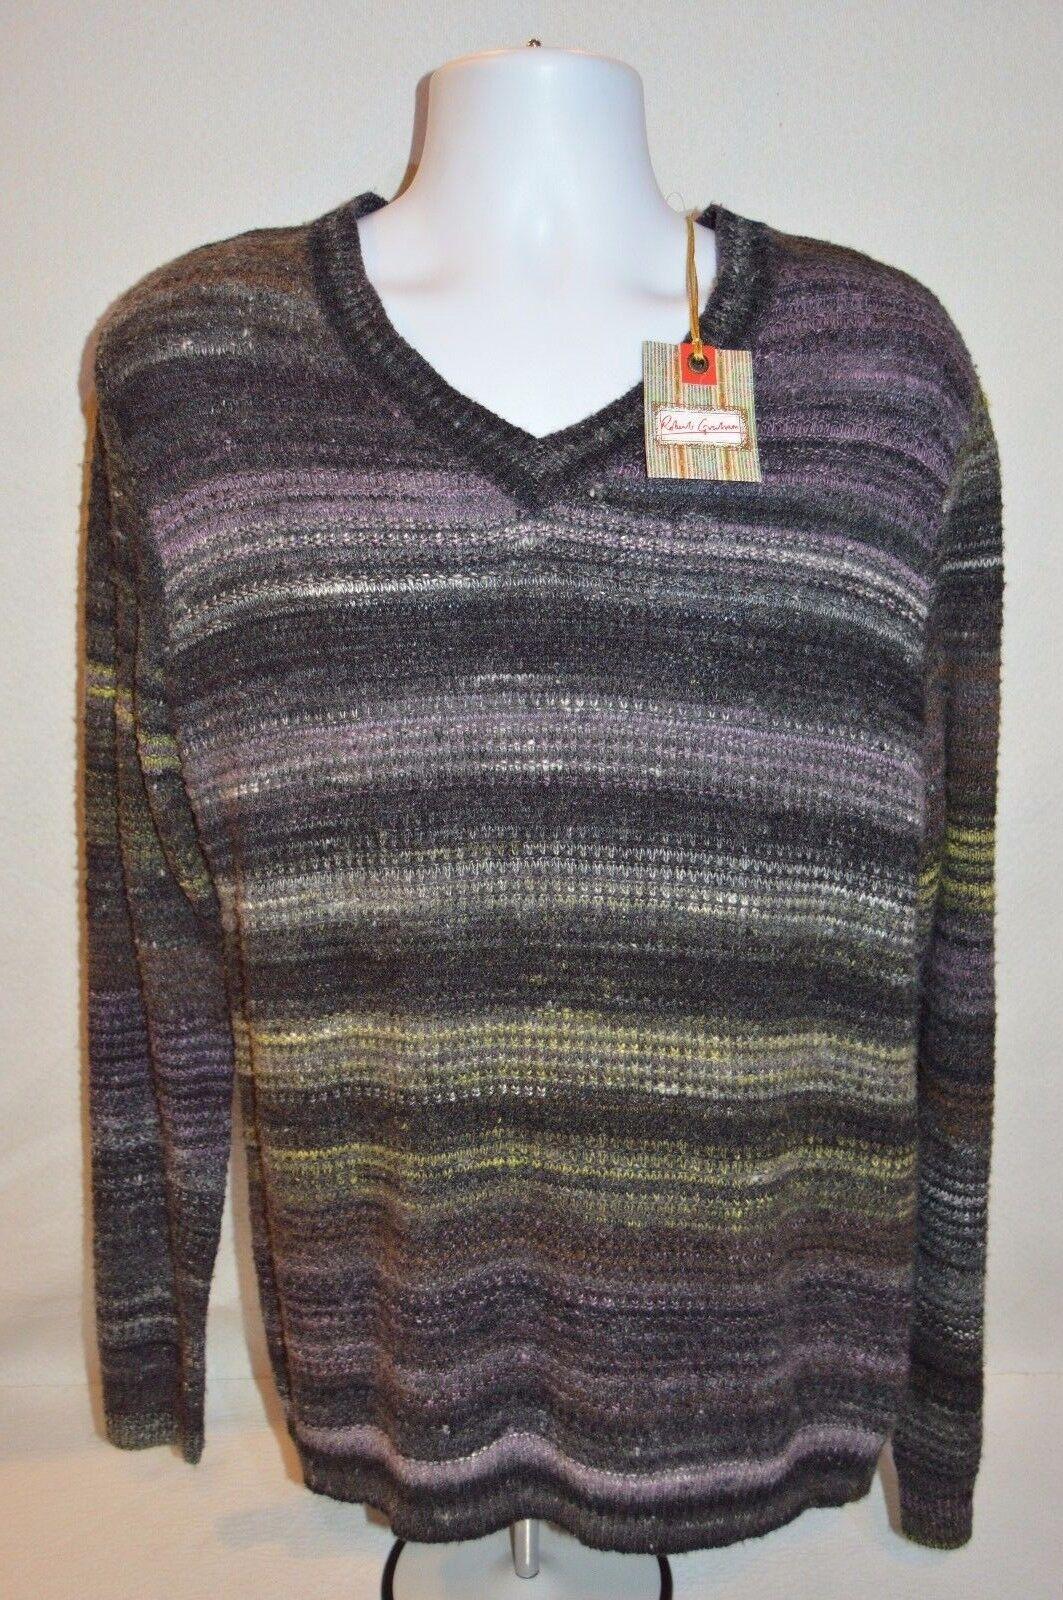 ROBERT GRAHAM Man's HUNTINGDON Space Dyed Sweater NEW Size Medium Retail